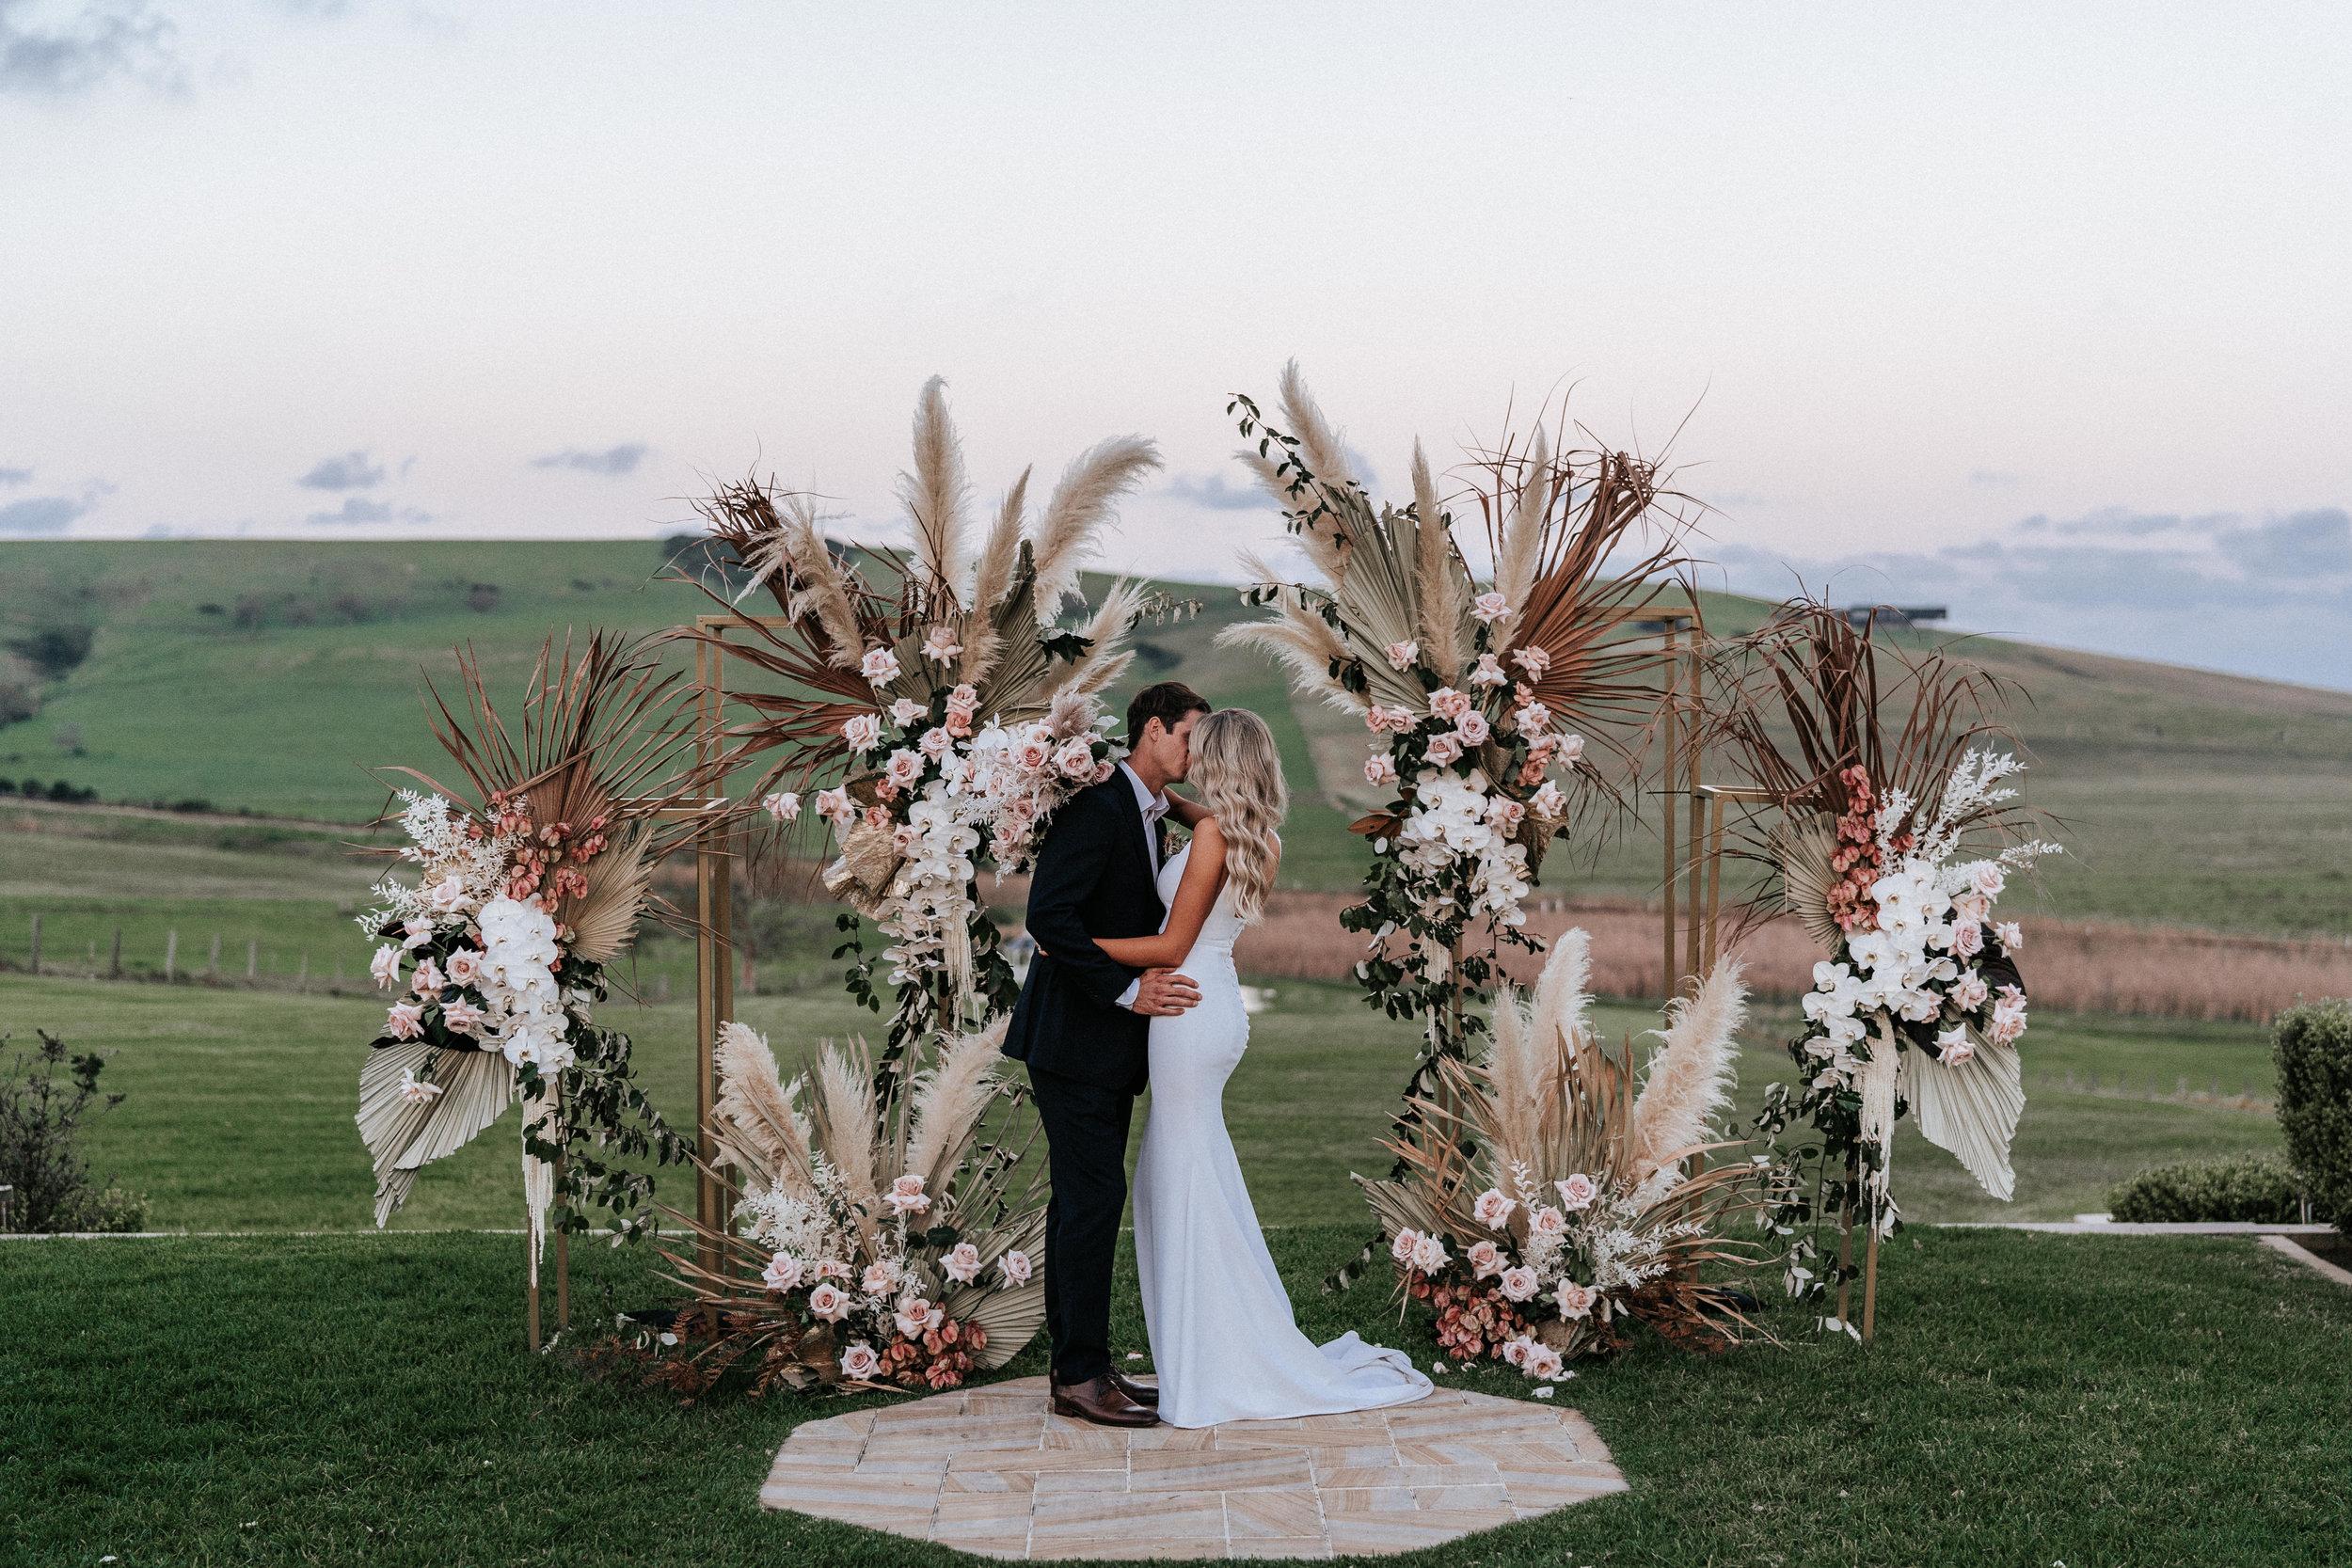 gemaya-tim-bilmon-wedding-832.jpg